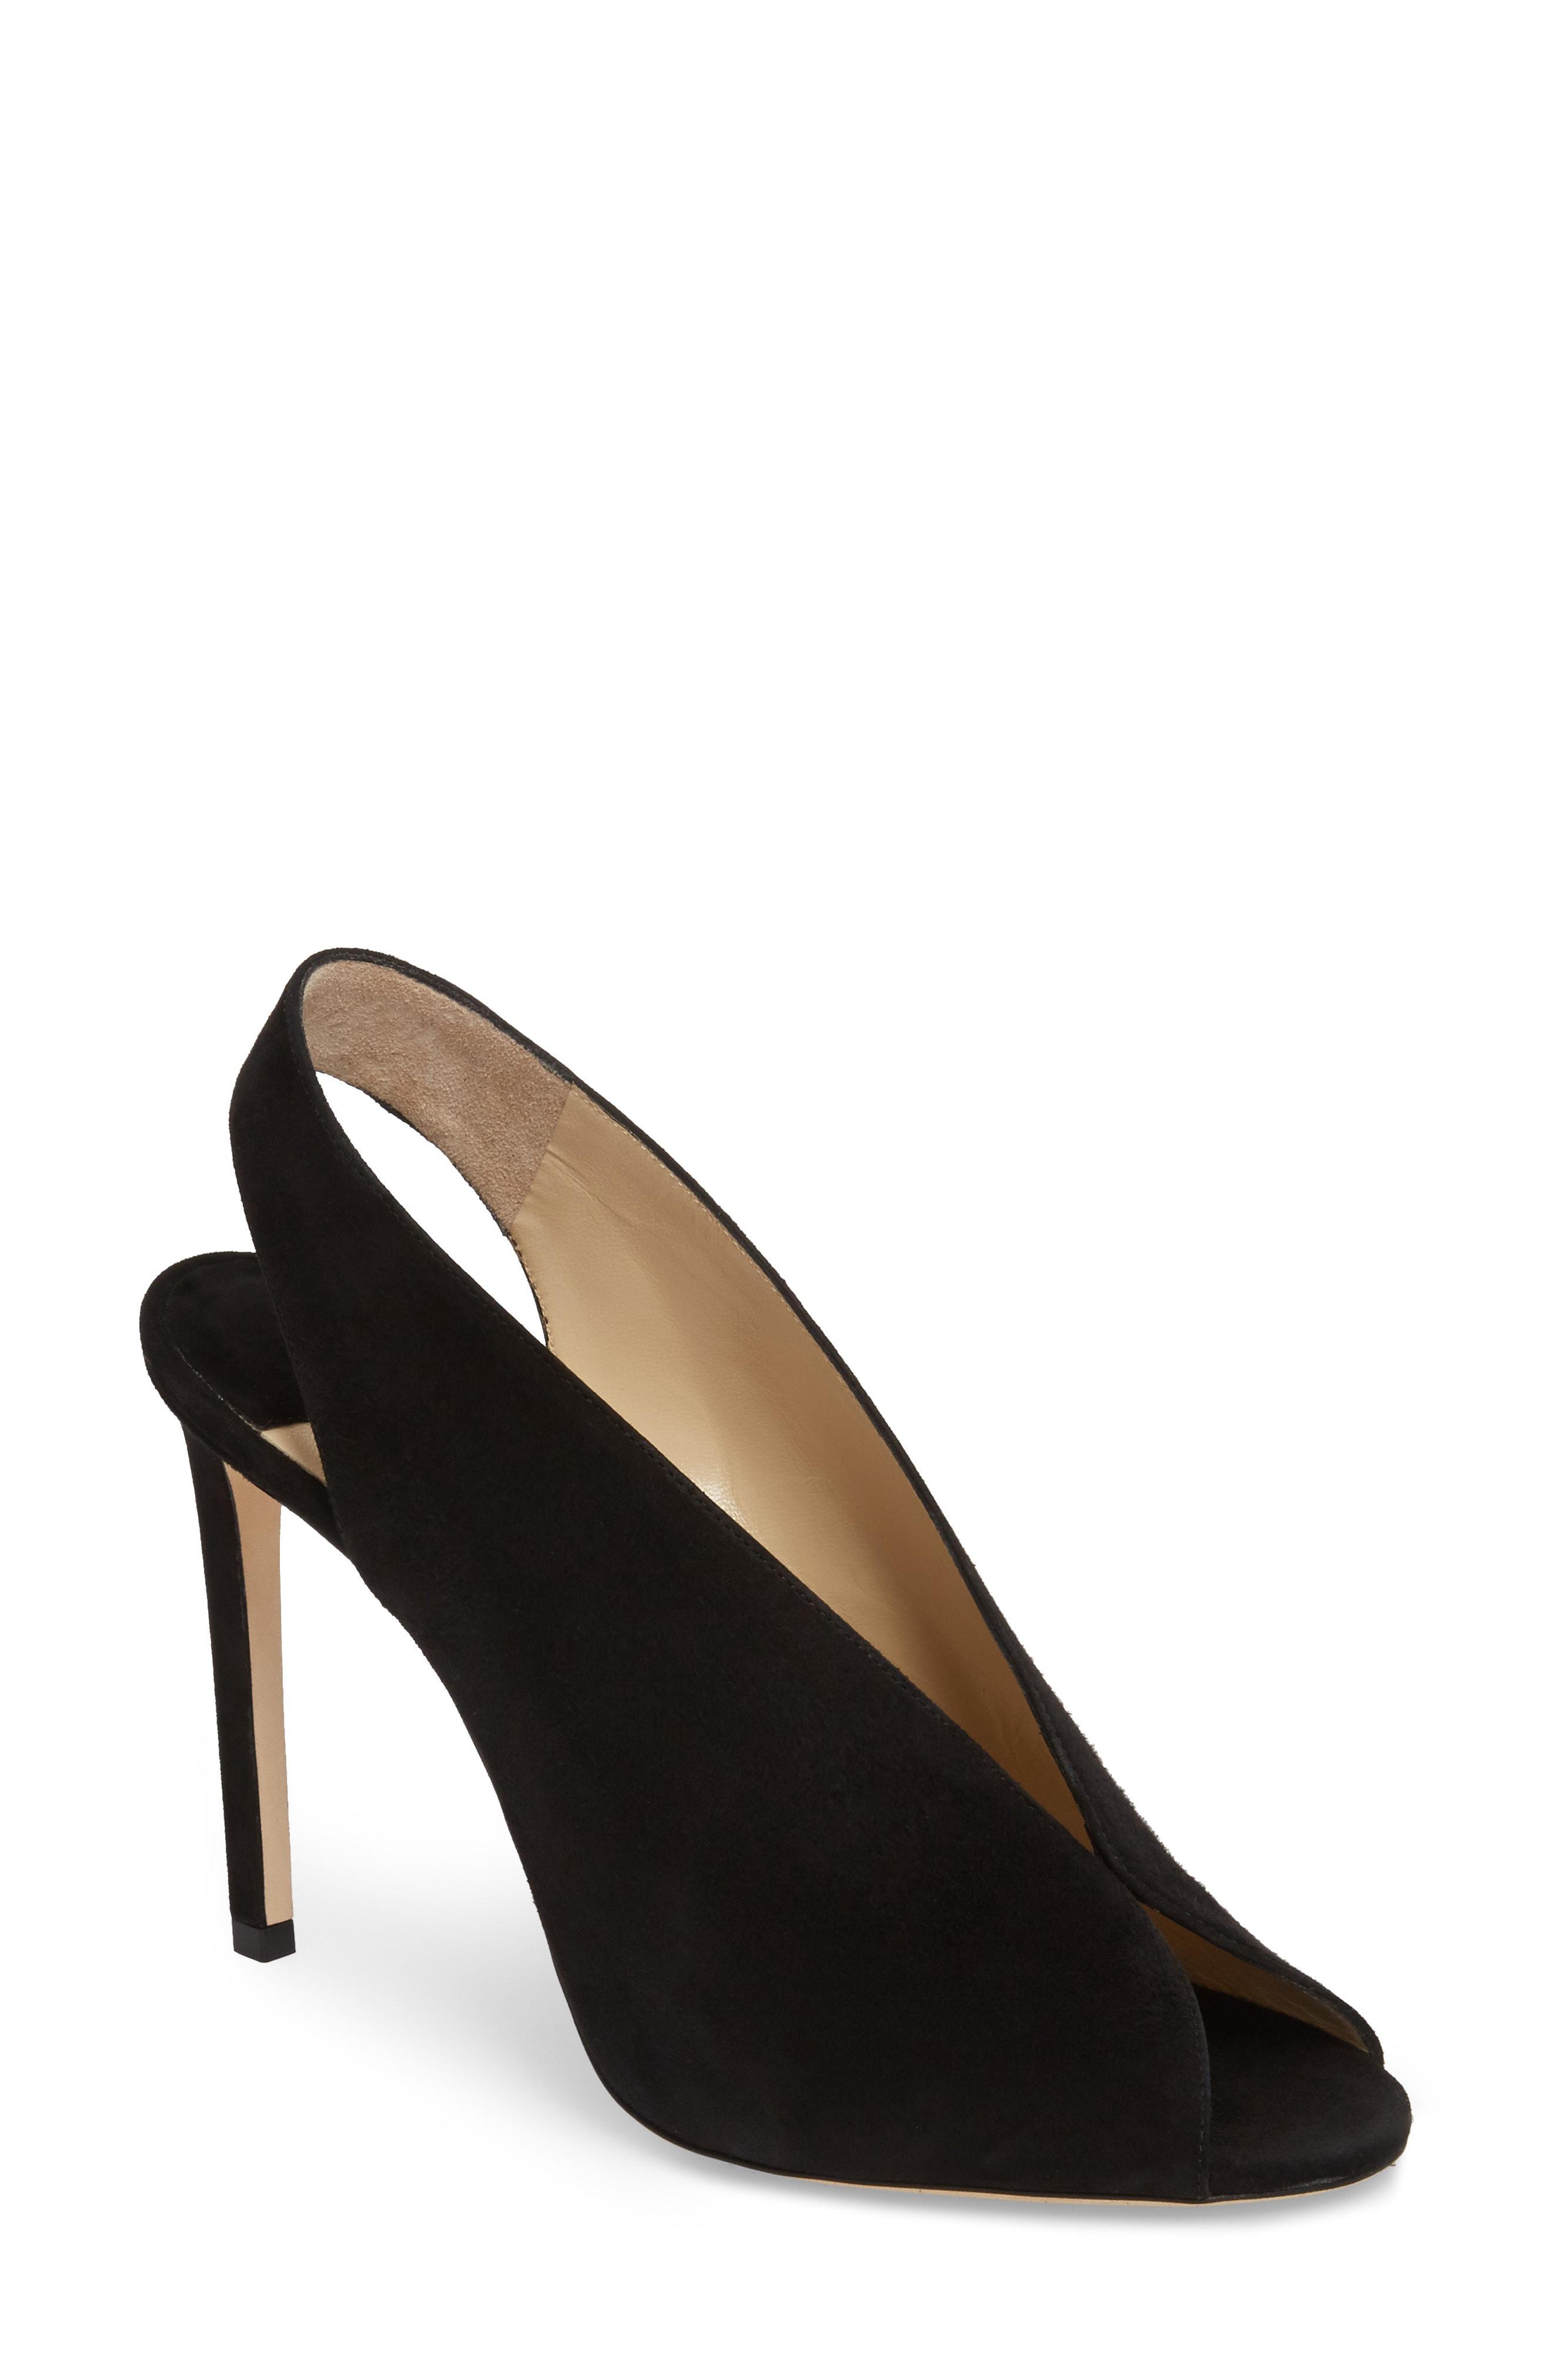 8be753221b4 Jimmy Choo Shar 85 Peep-Toe Suede Slingback Sandals In Black